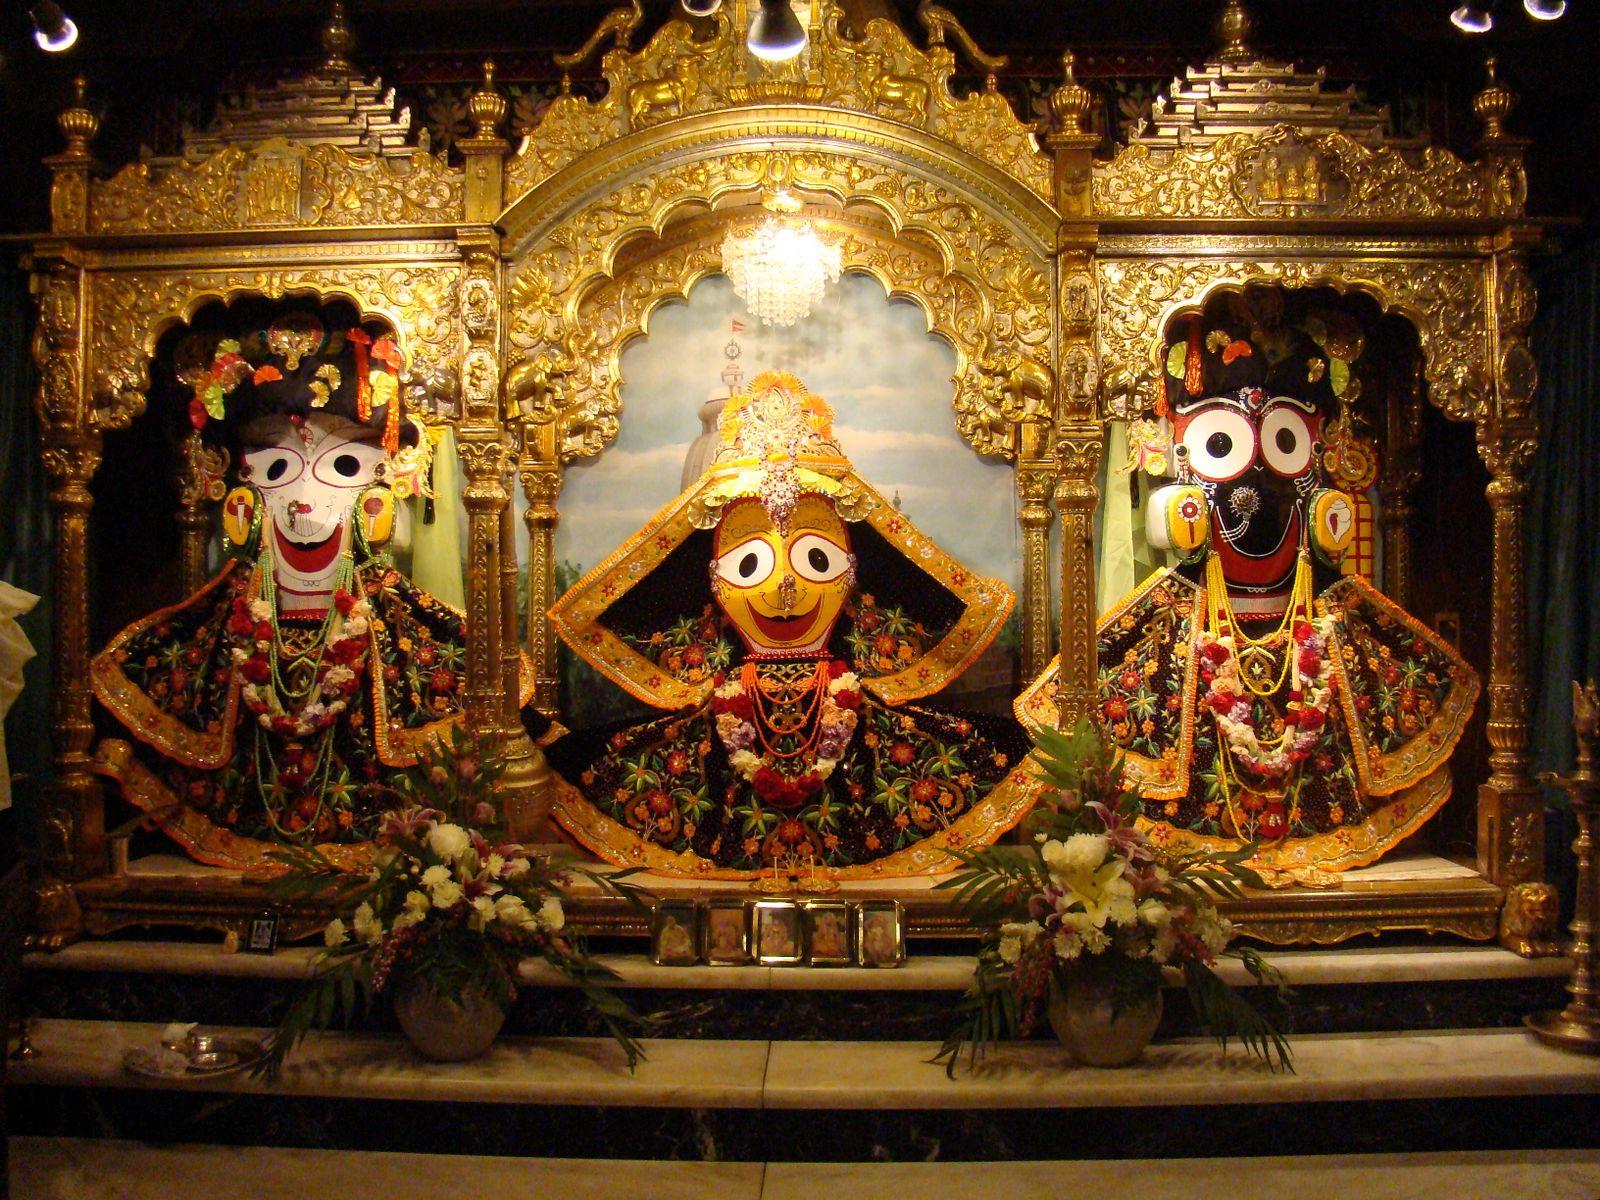 Amazing Wallpaper Lord Jagannath Puri - Lord-Jagannath  Snapshot_132779.jpg